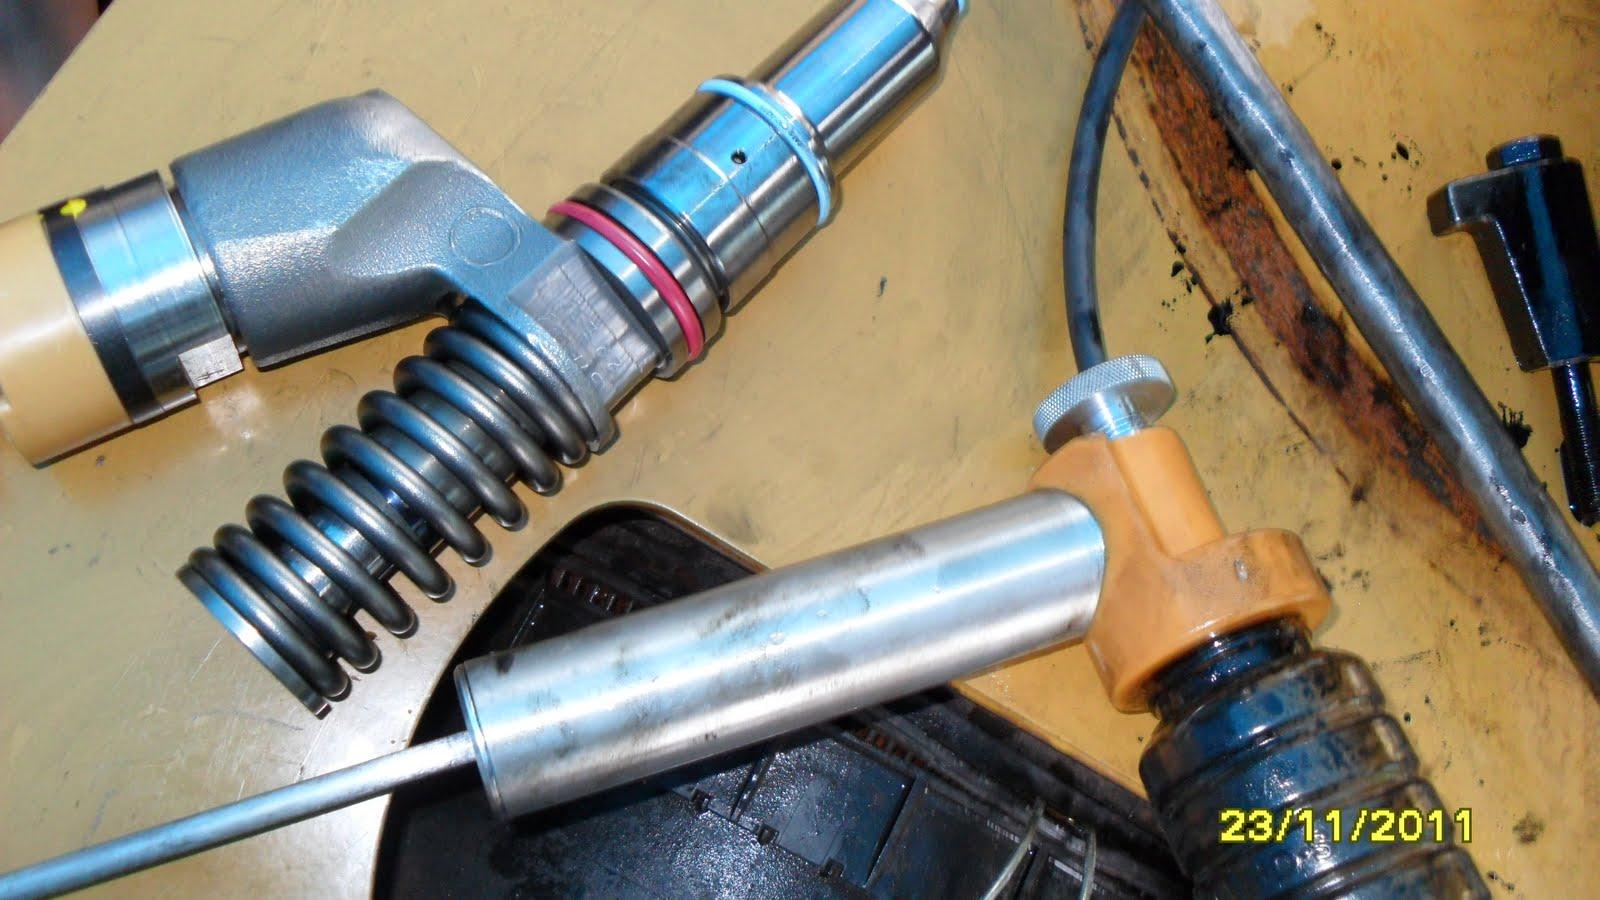 966H CAT: Electronic Unit Injector - Adjust